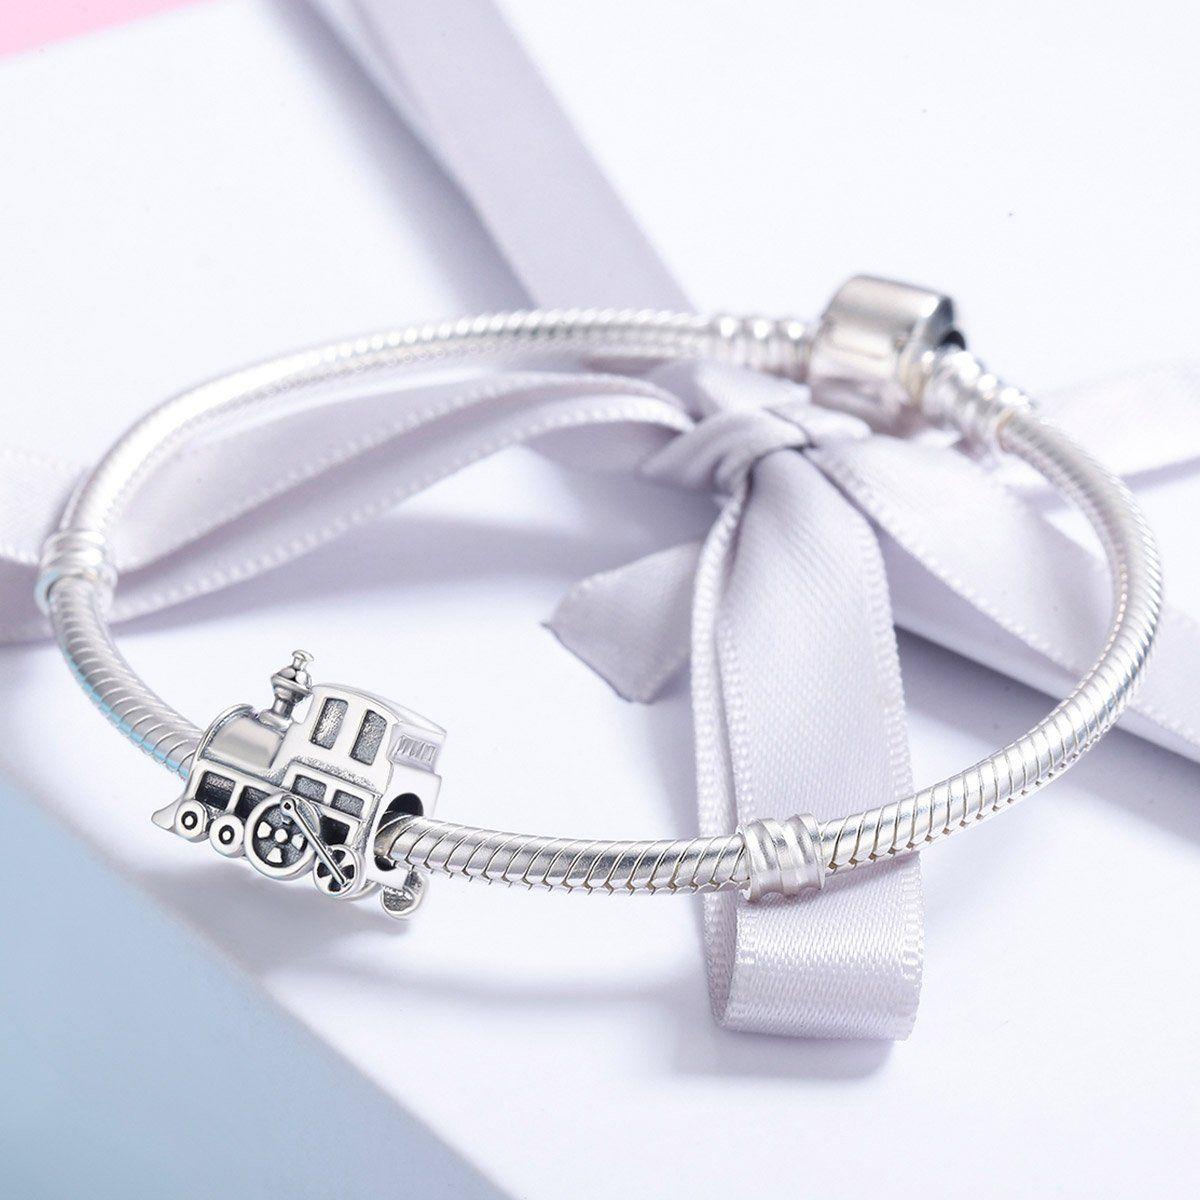 Everbling NO LOGO Open Bangle 925 Sterling Silver Charm Bracelet